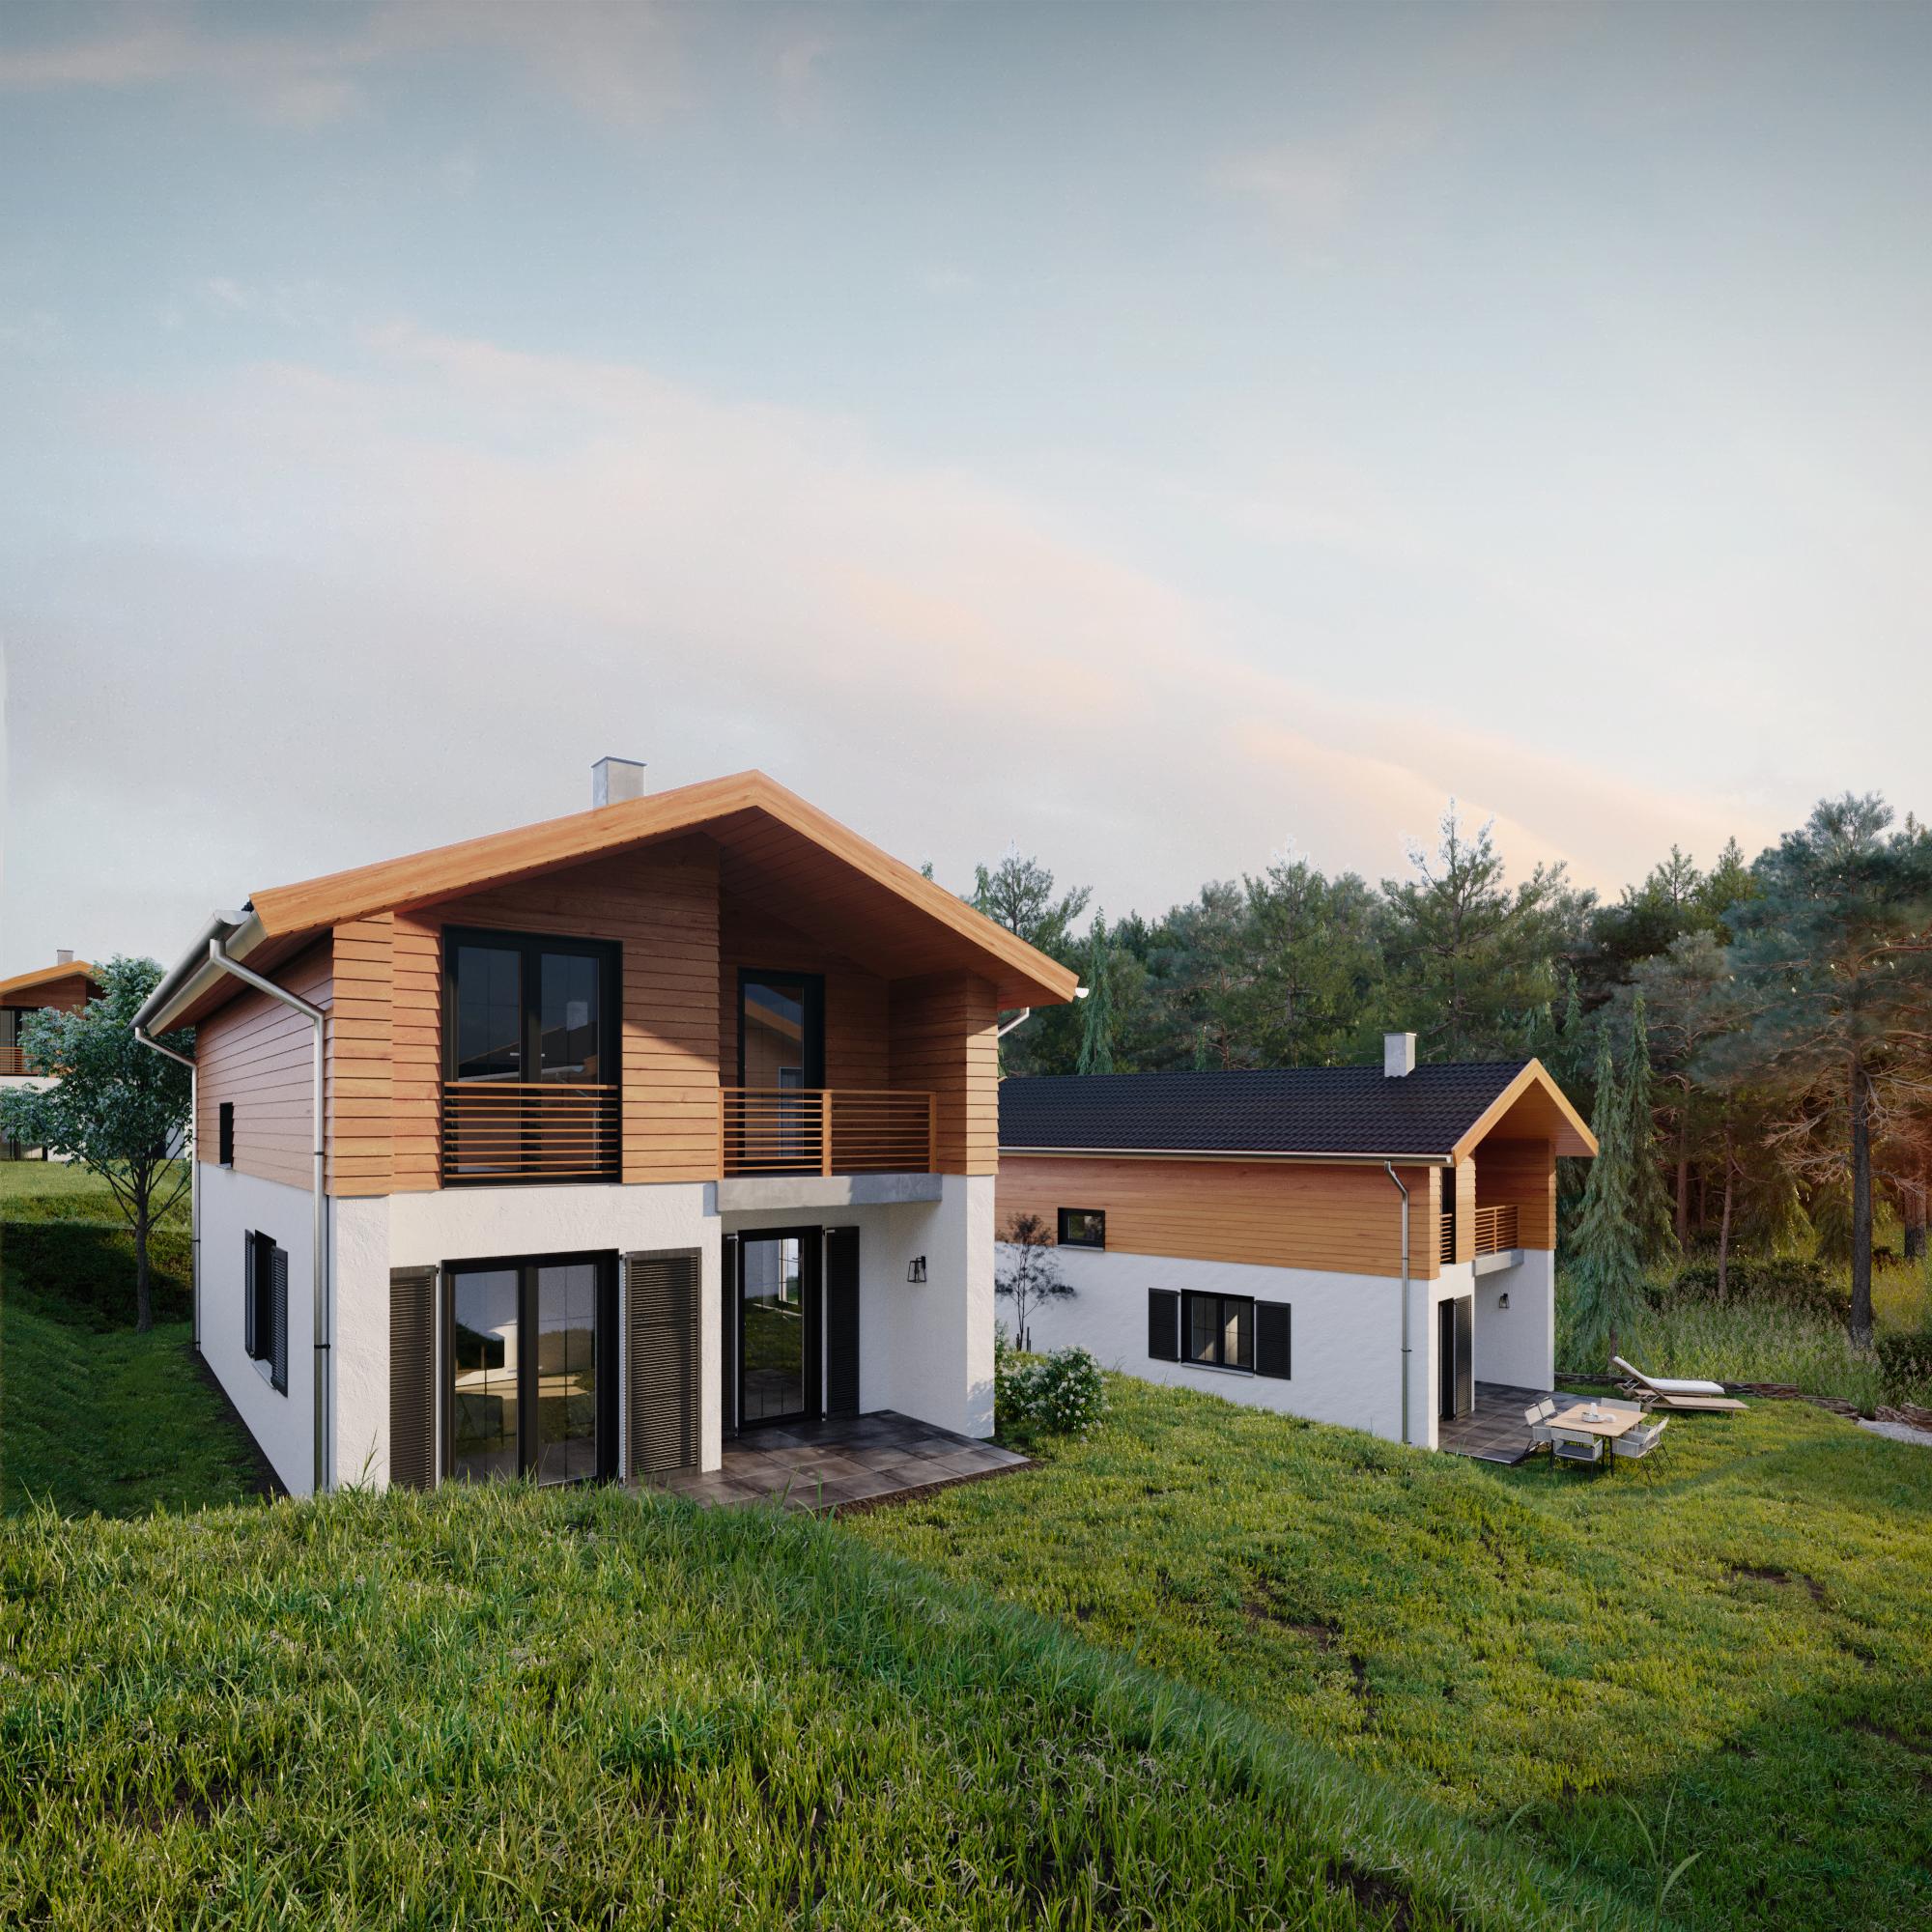 Top bungalow Sauerland 🏕️UplandParcs Winterberg